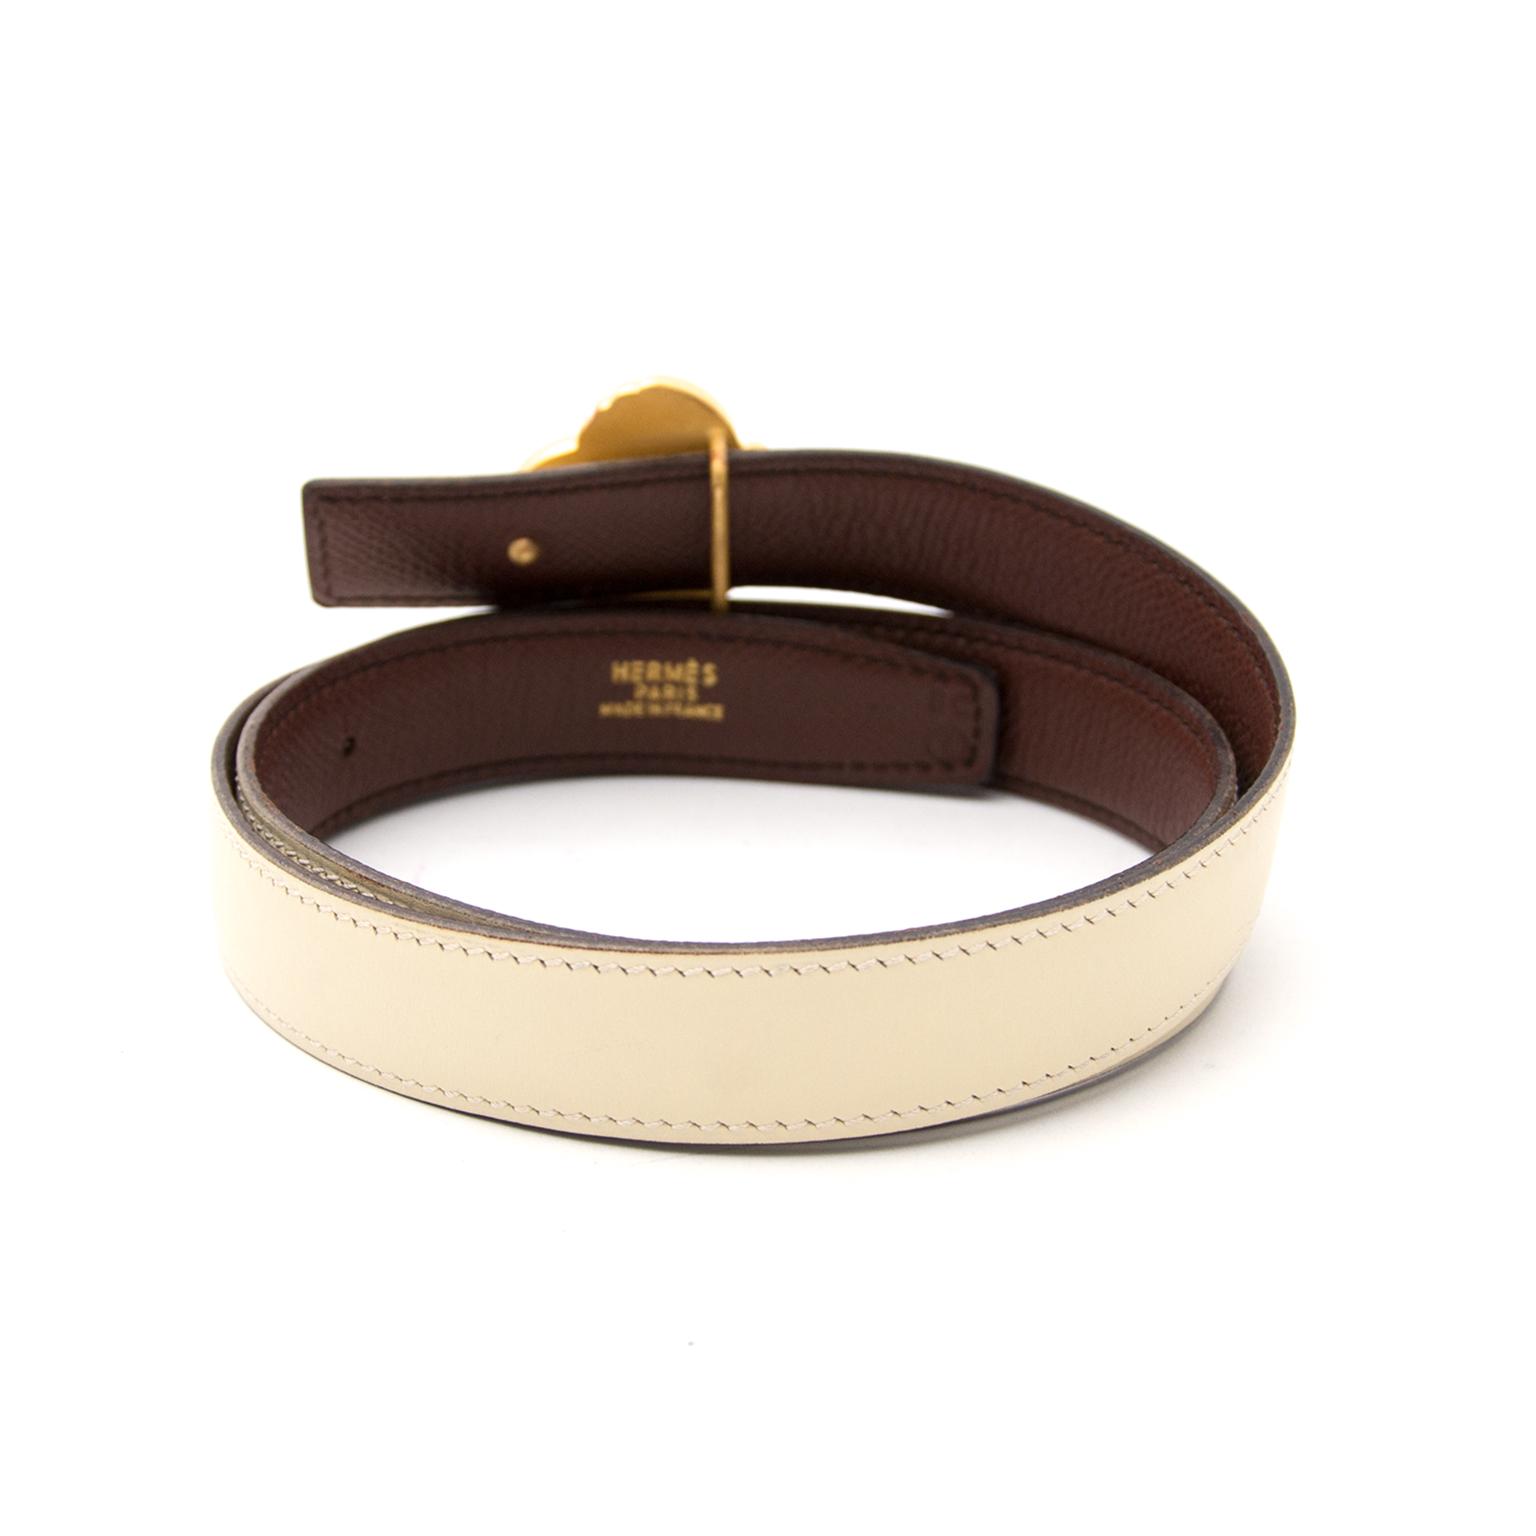 hermes cream/brown gold flower belt now online at labellov.com